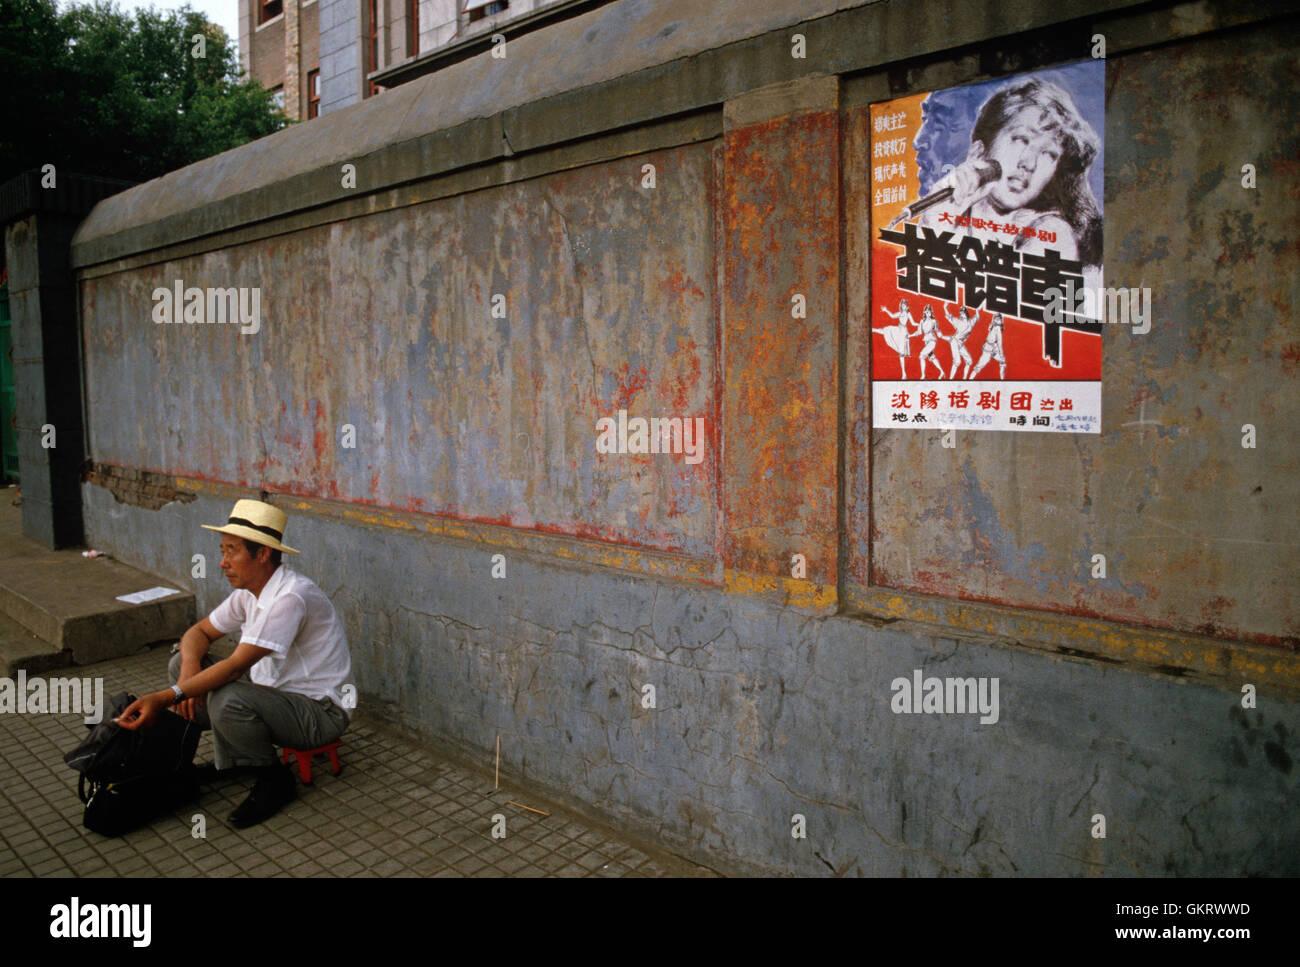 Mann kauert sich neben Wand mit Popmusik Poster, Shenyang, China. Stockfoto